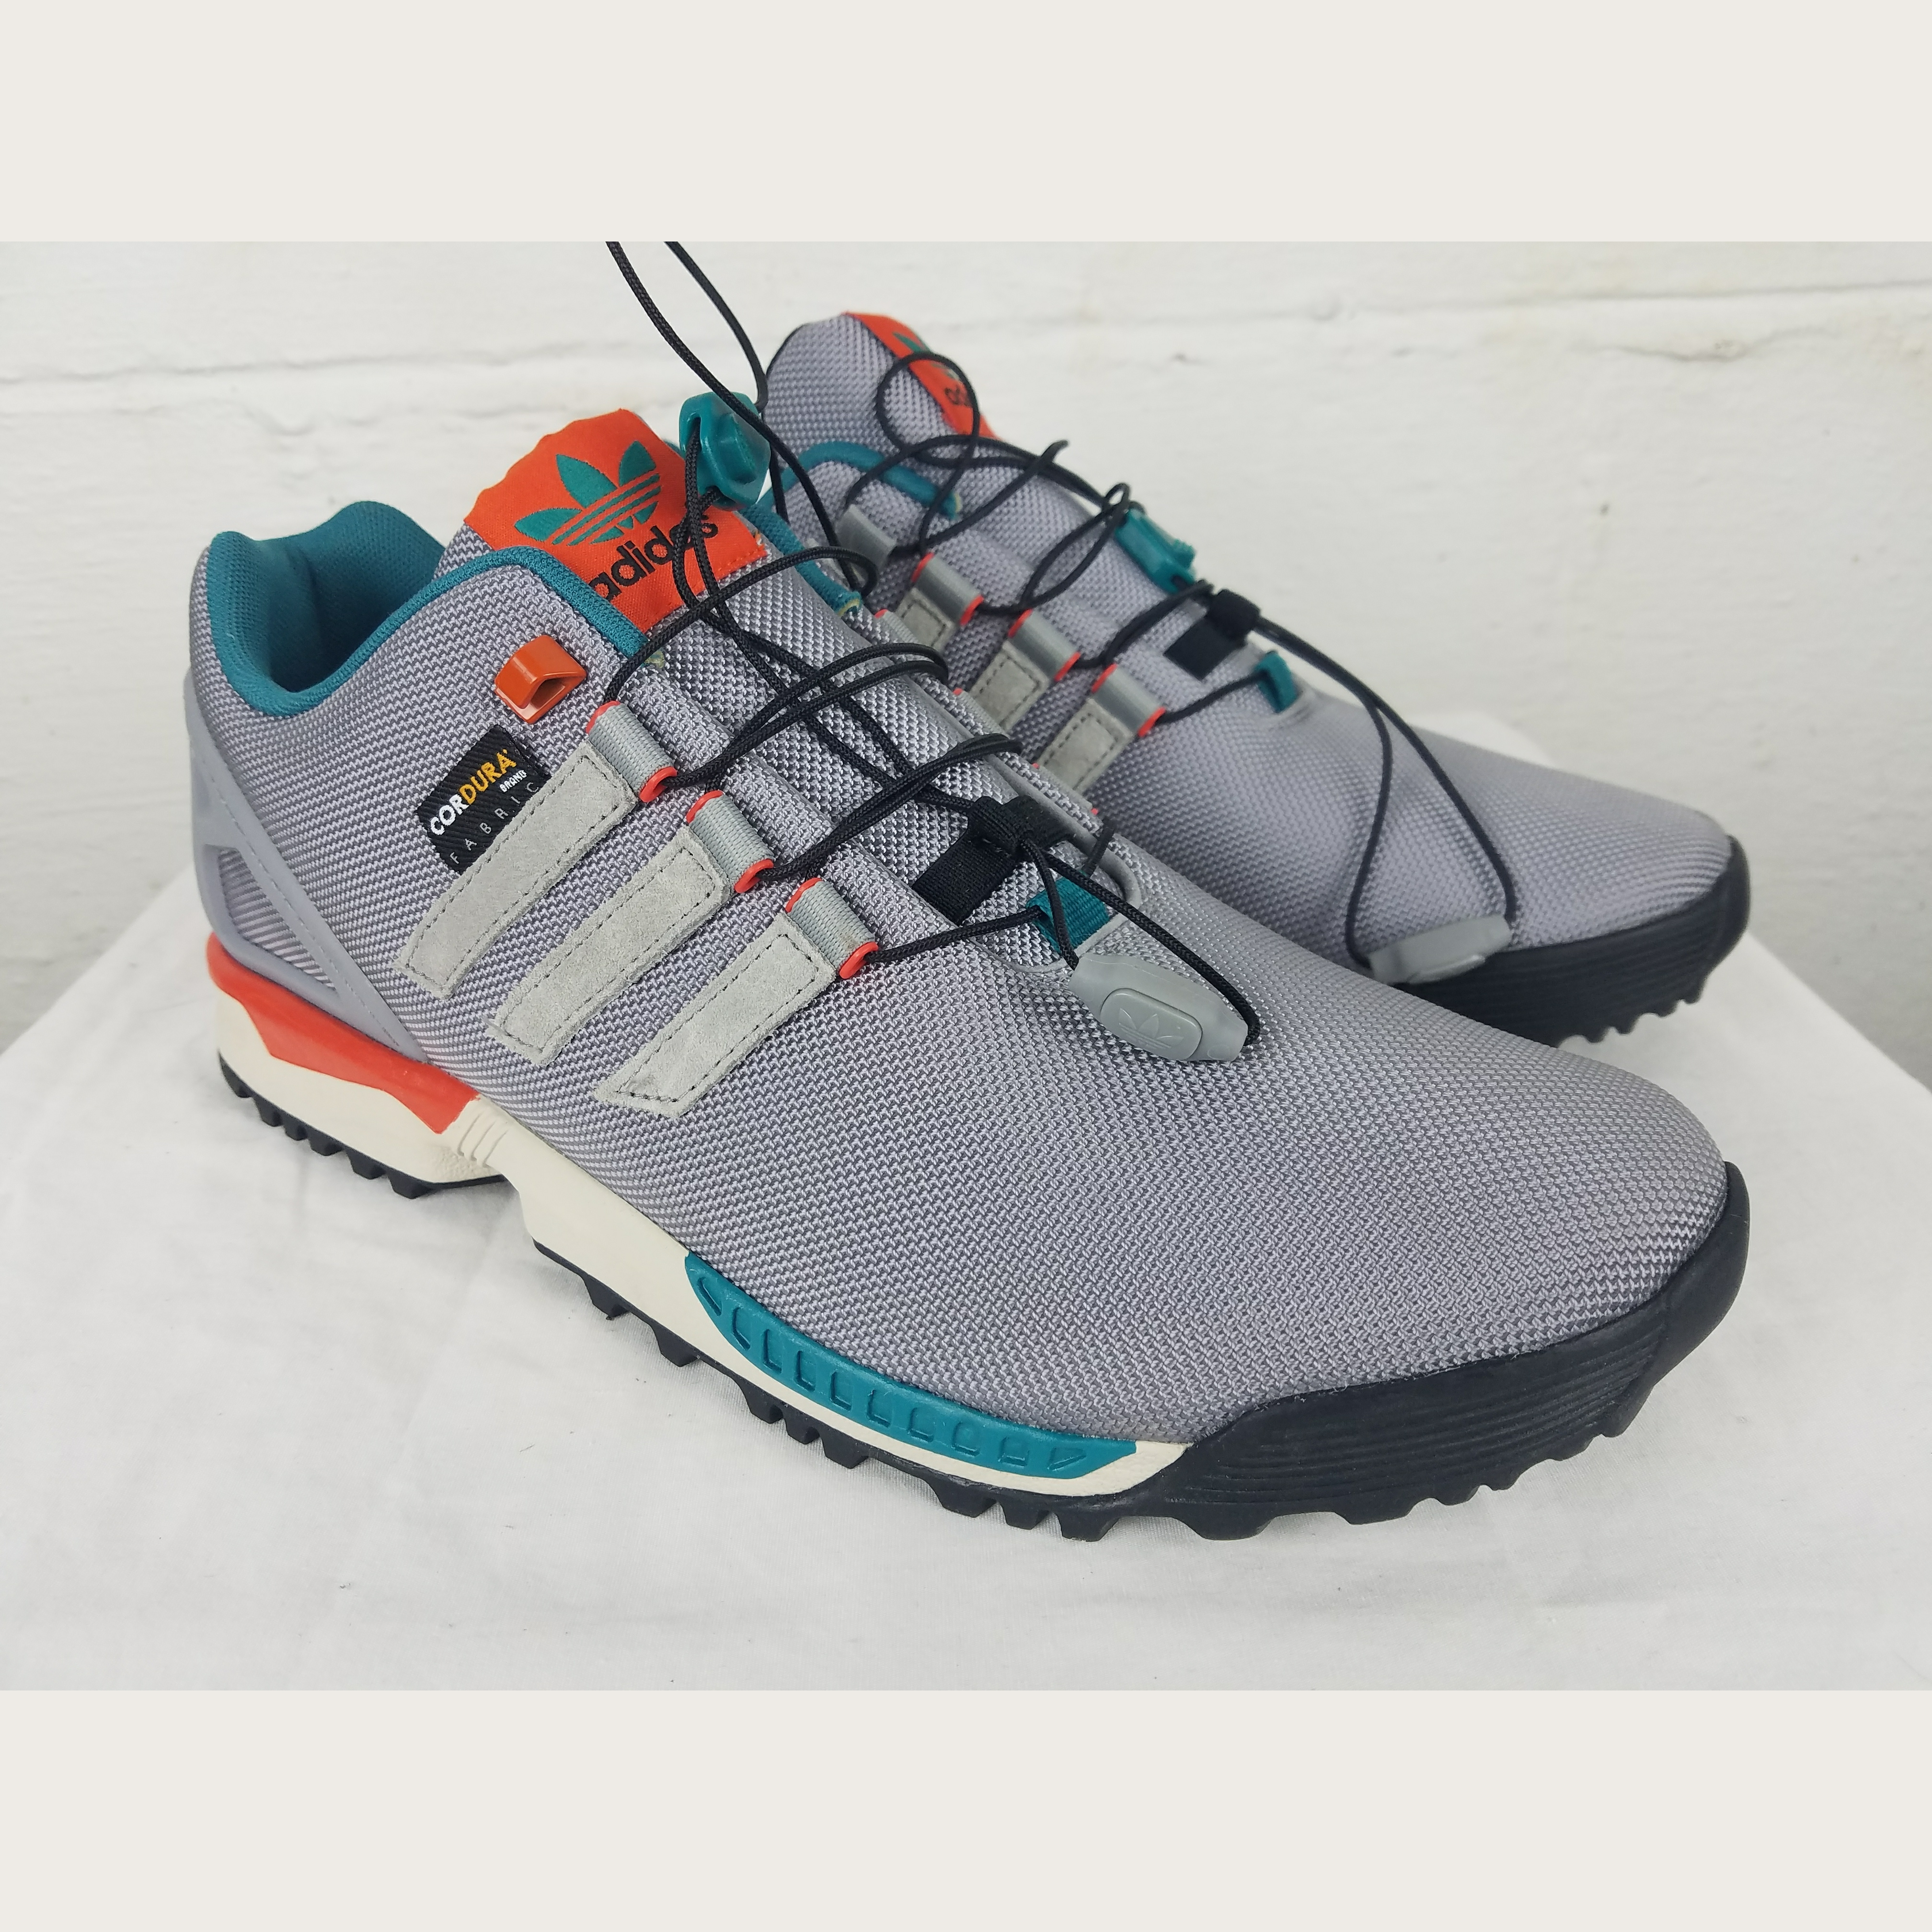 huge discount 3e567 e0f67 Adidas. NEW ZX Flux Winter Cordura